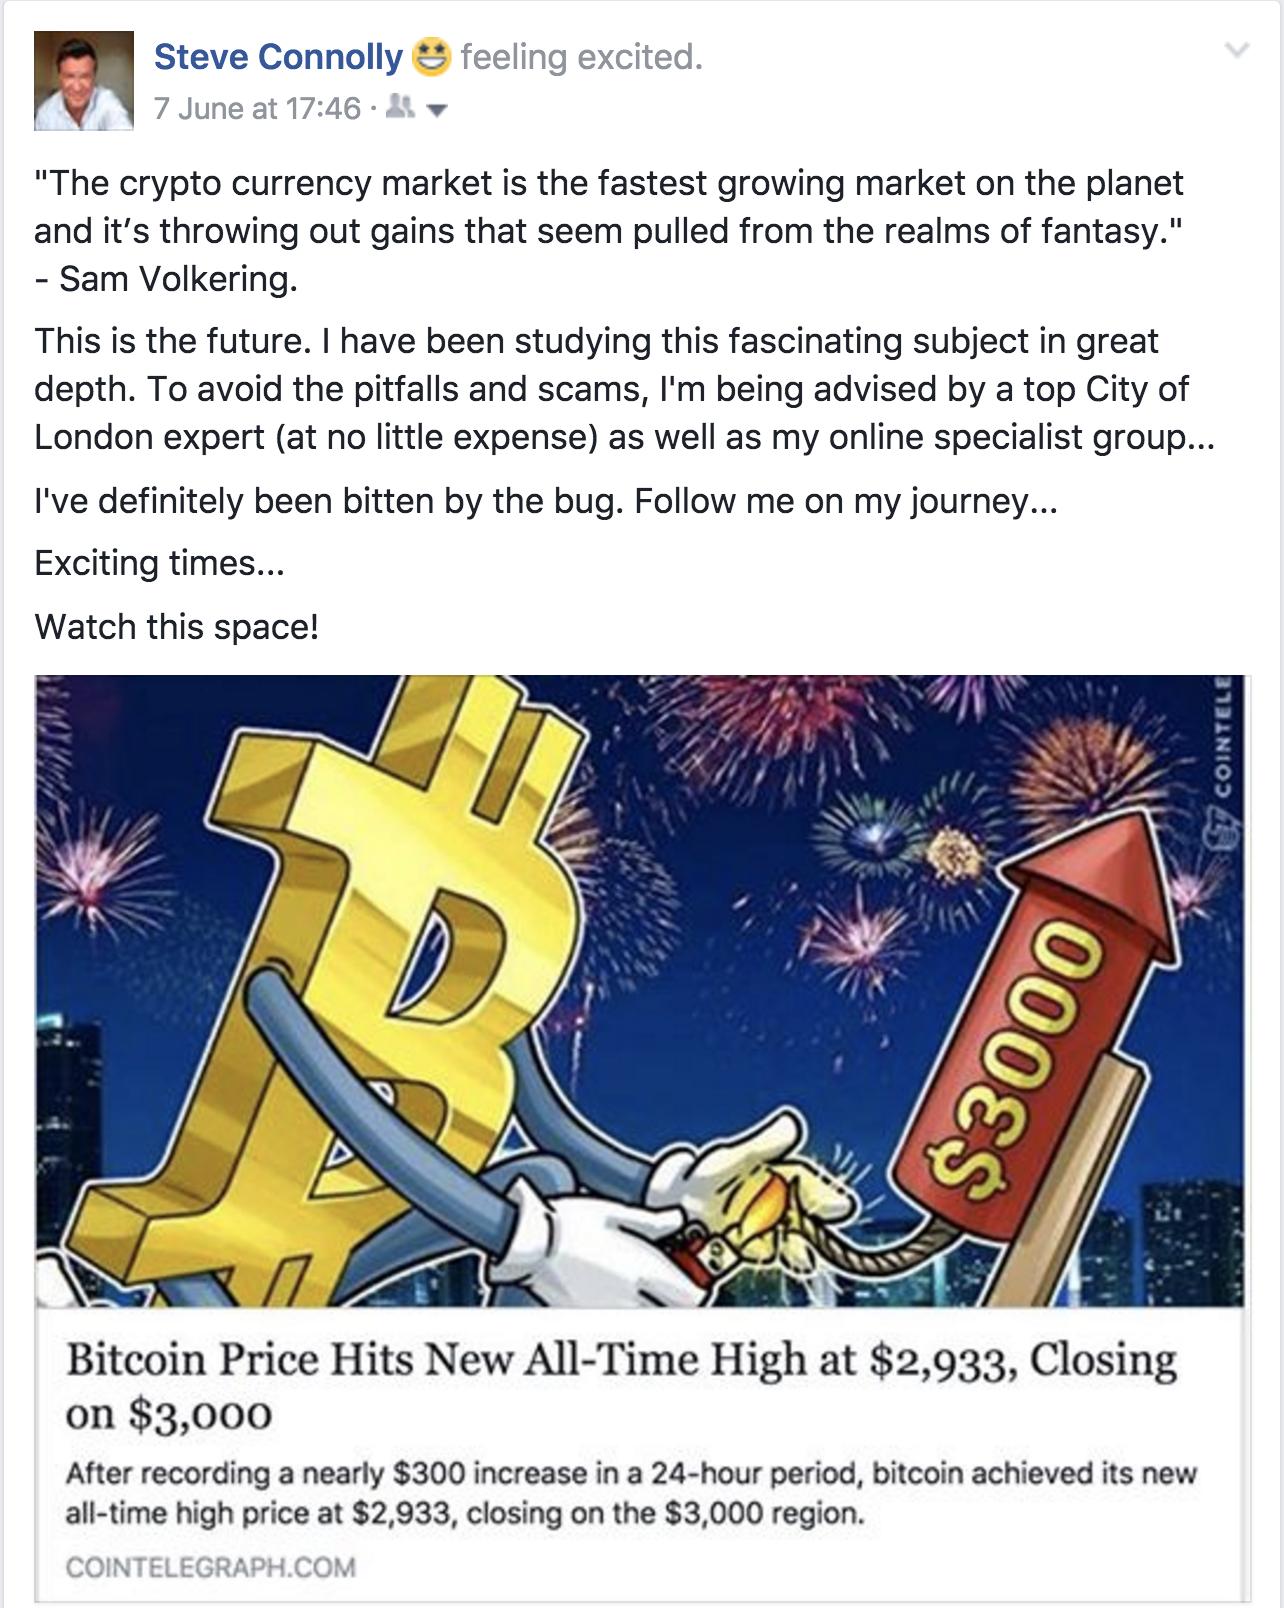 The Bitcoin explosion